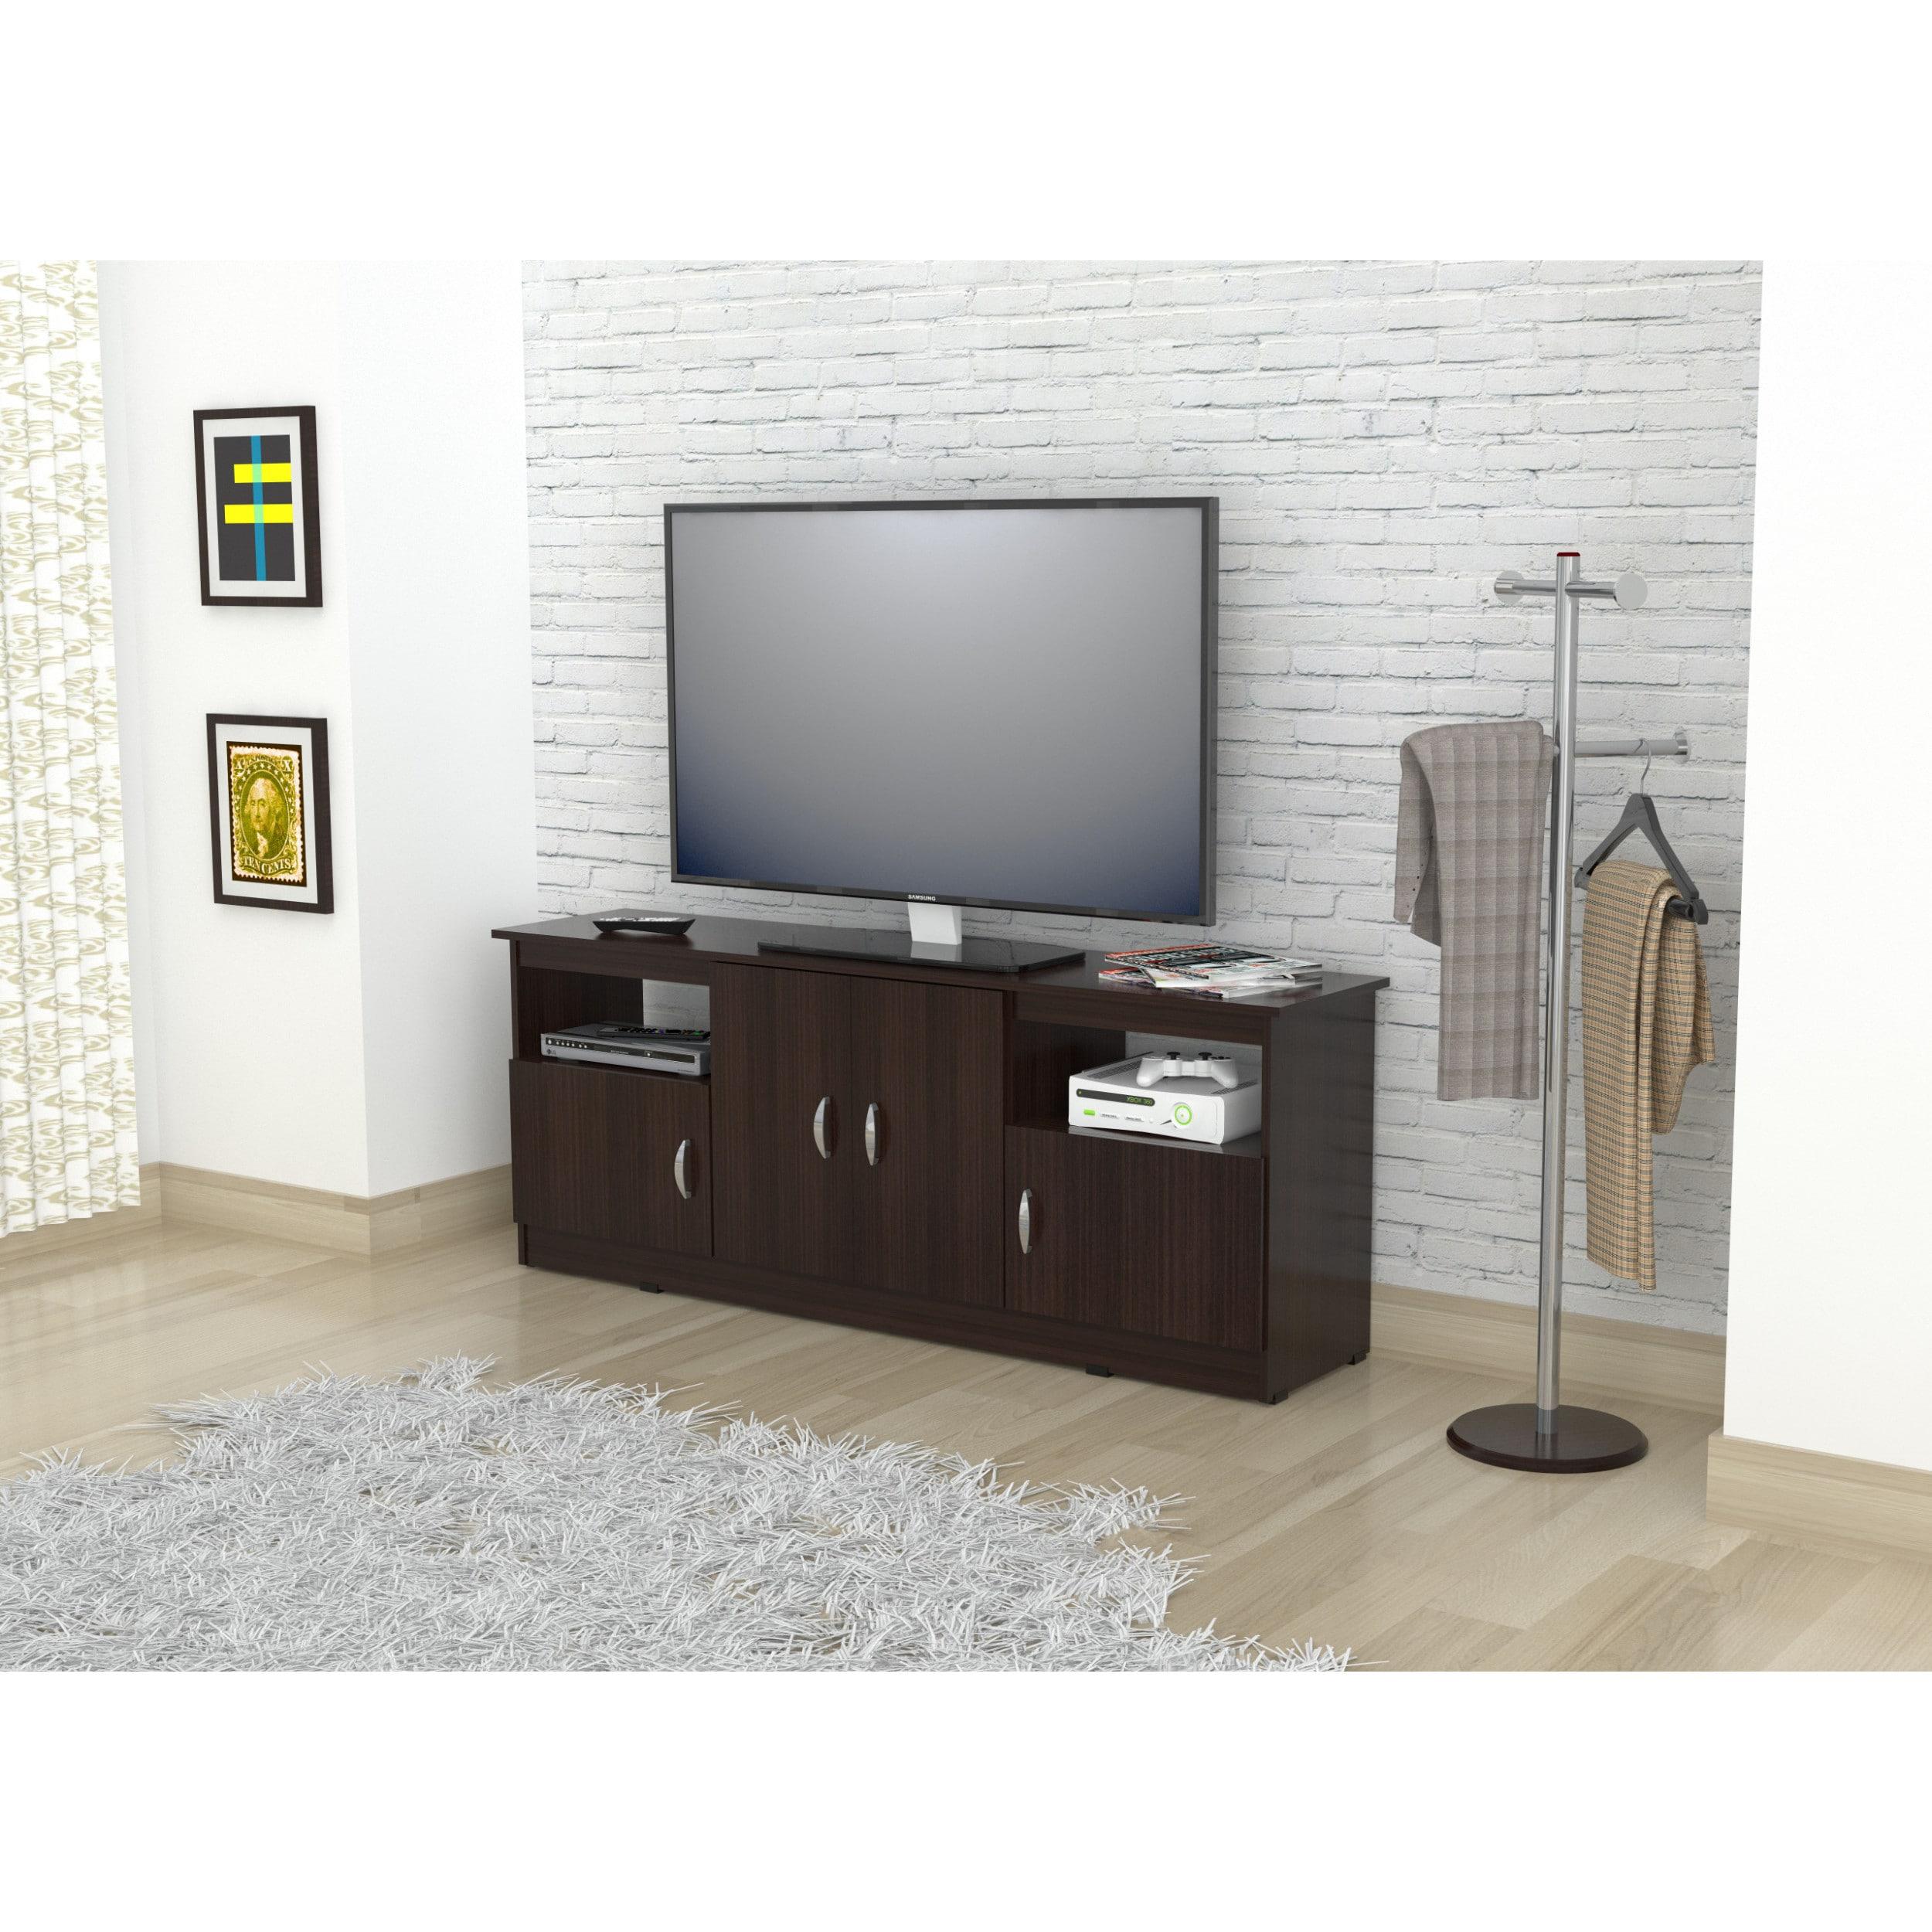 Inval America LLC Inval 60-inch Espresso-wenge Flat Panel TV Stand at Sears.com